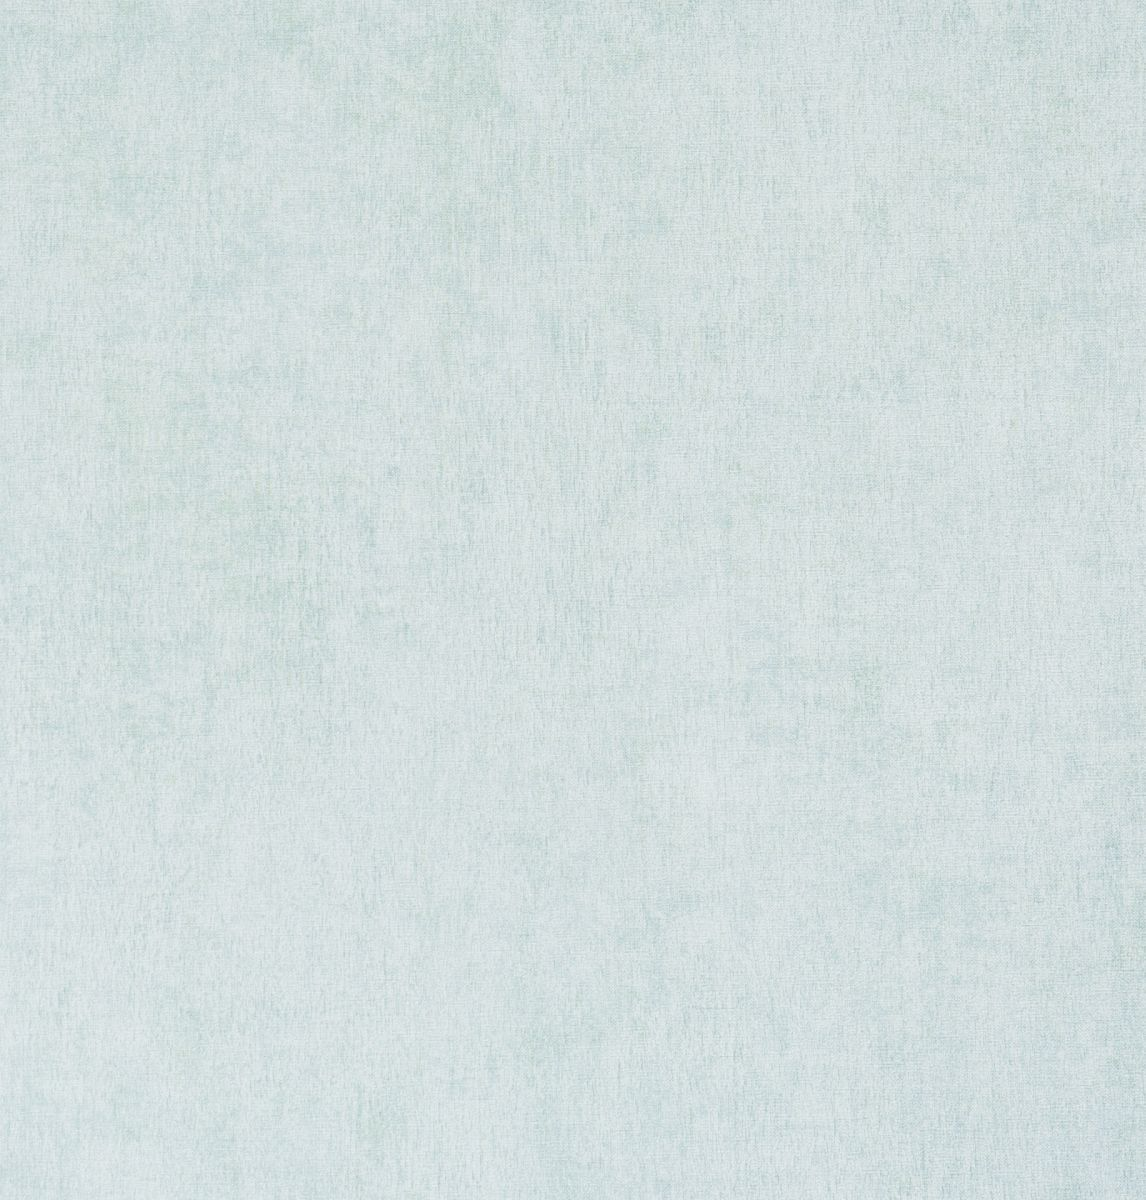 hochwertige tapeten und stoffe muster tapete 48473 decowunder. Black Bedroom Furniture Sets. Home Design Ideas